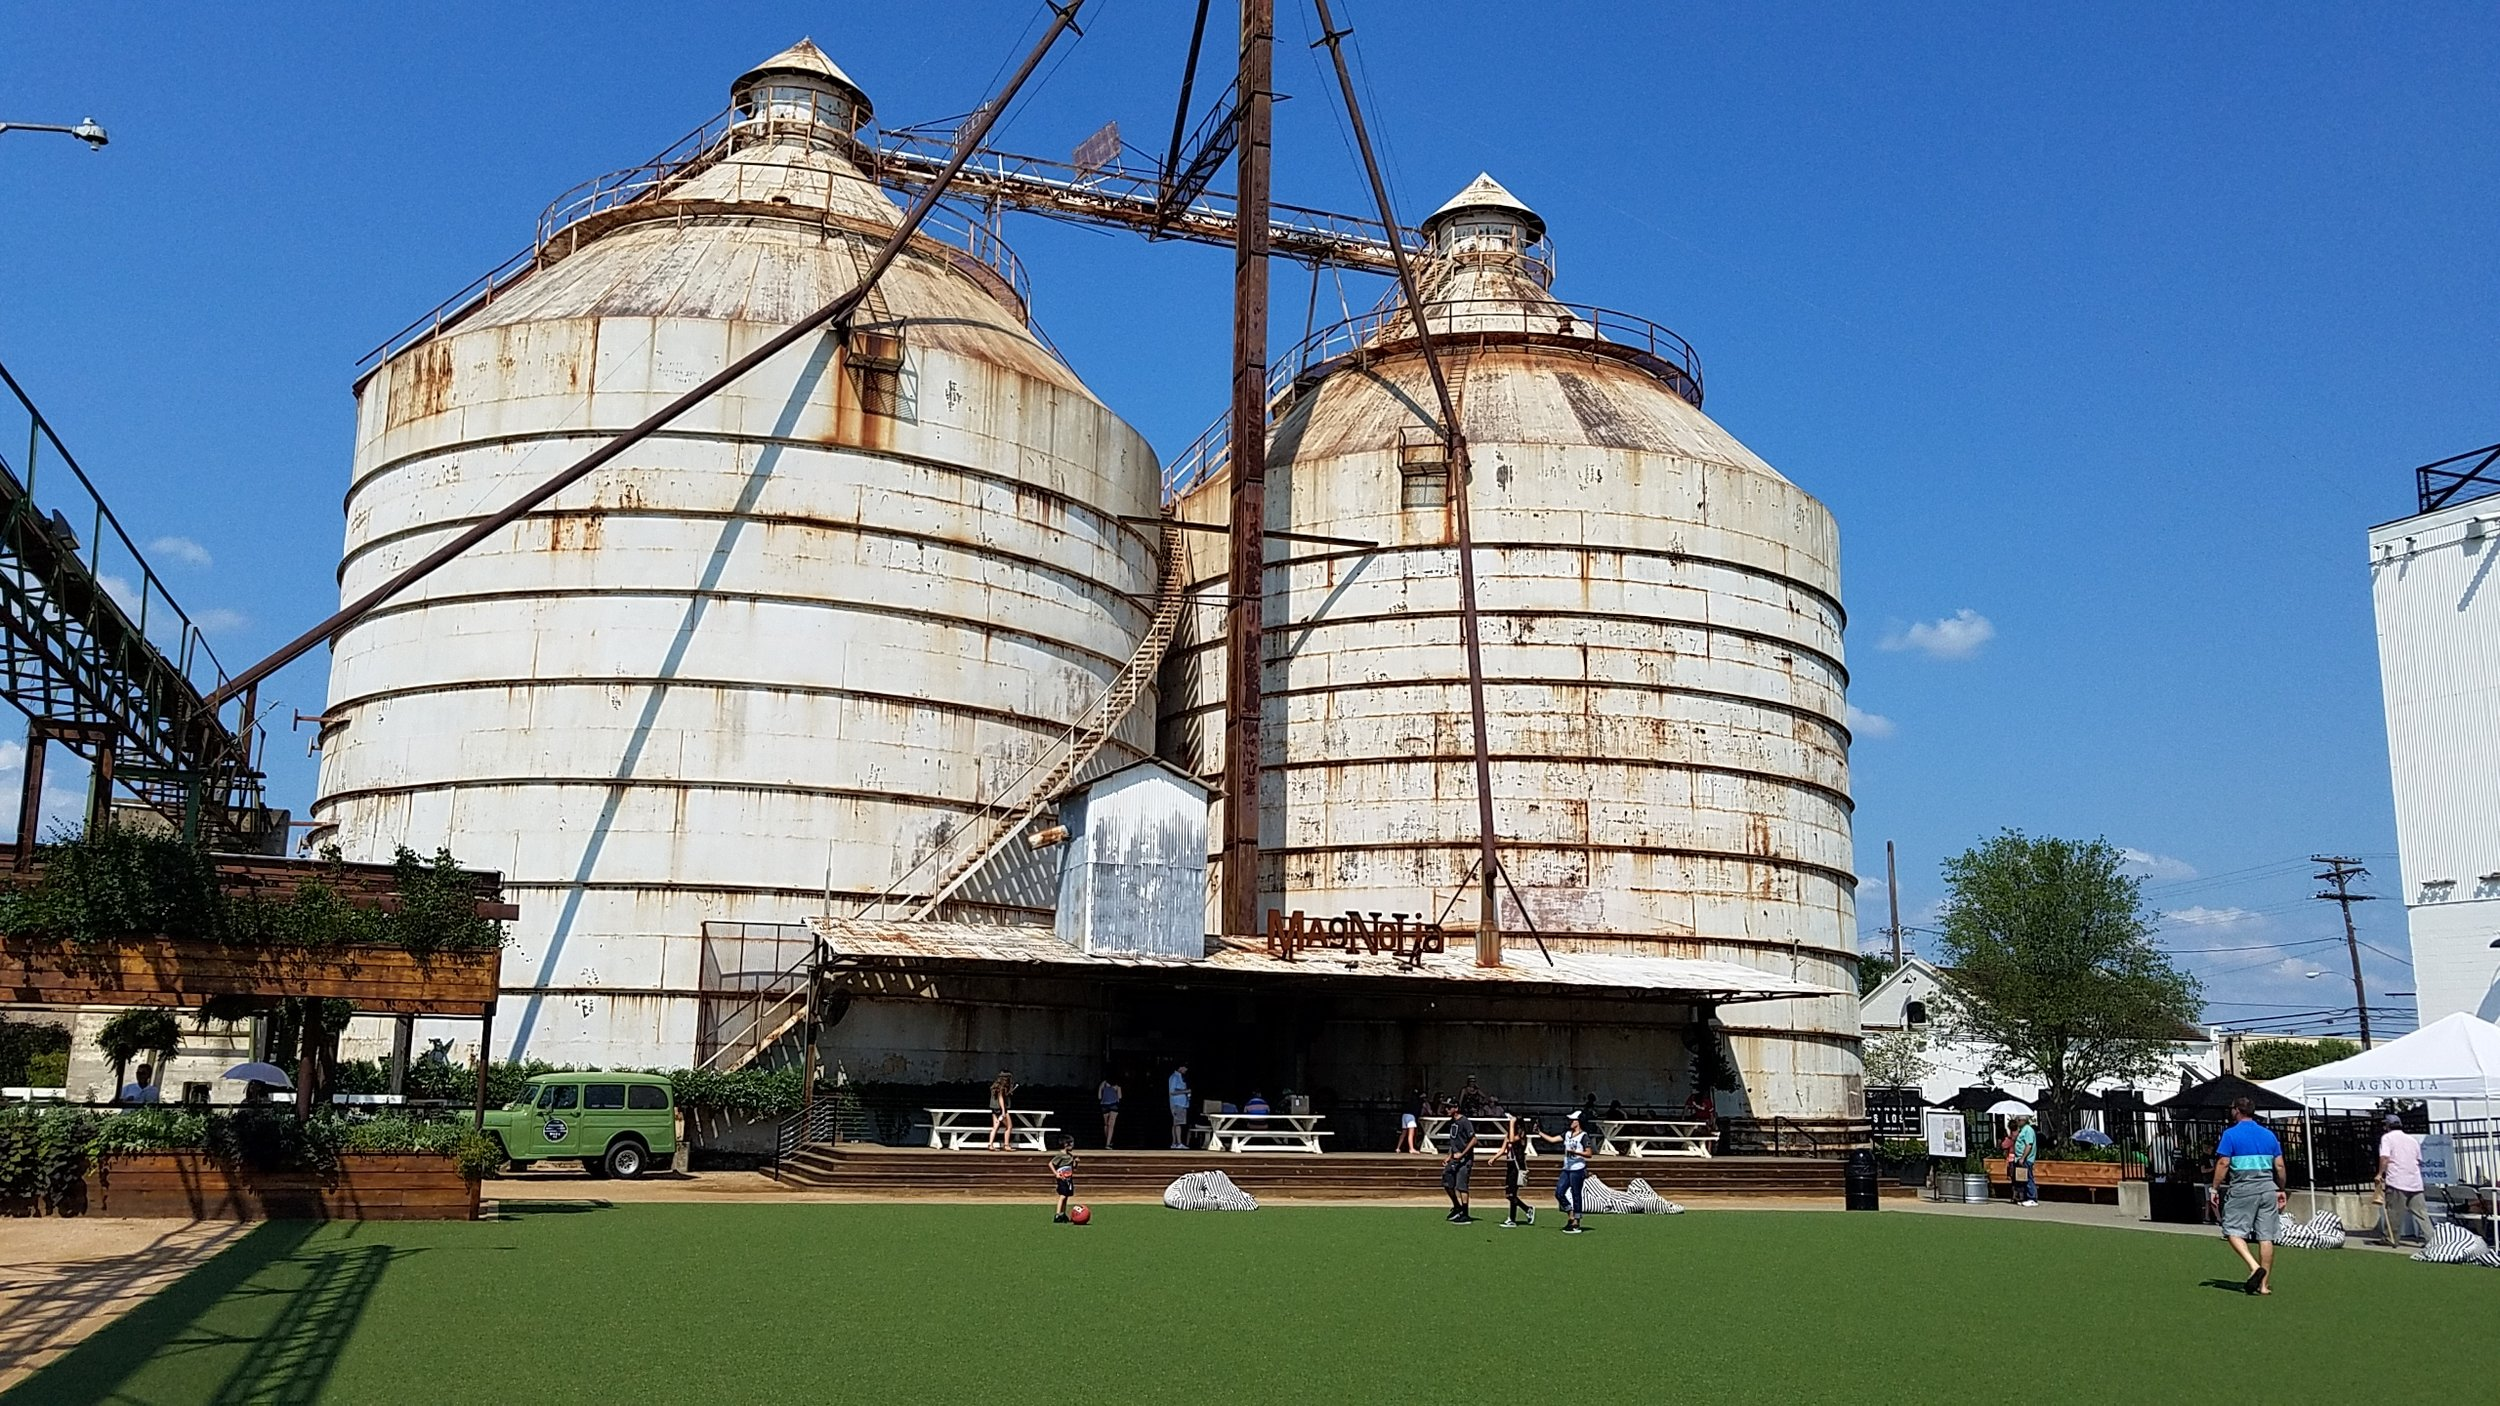 Magnolia_Market,_Waco,_TX.jpg